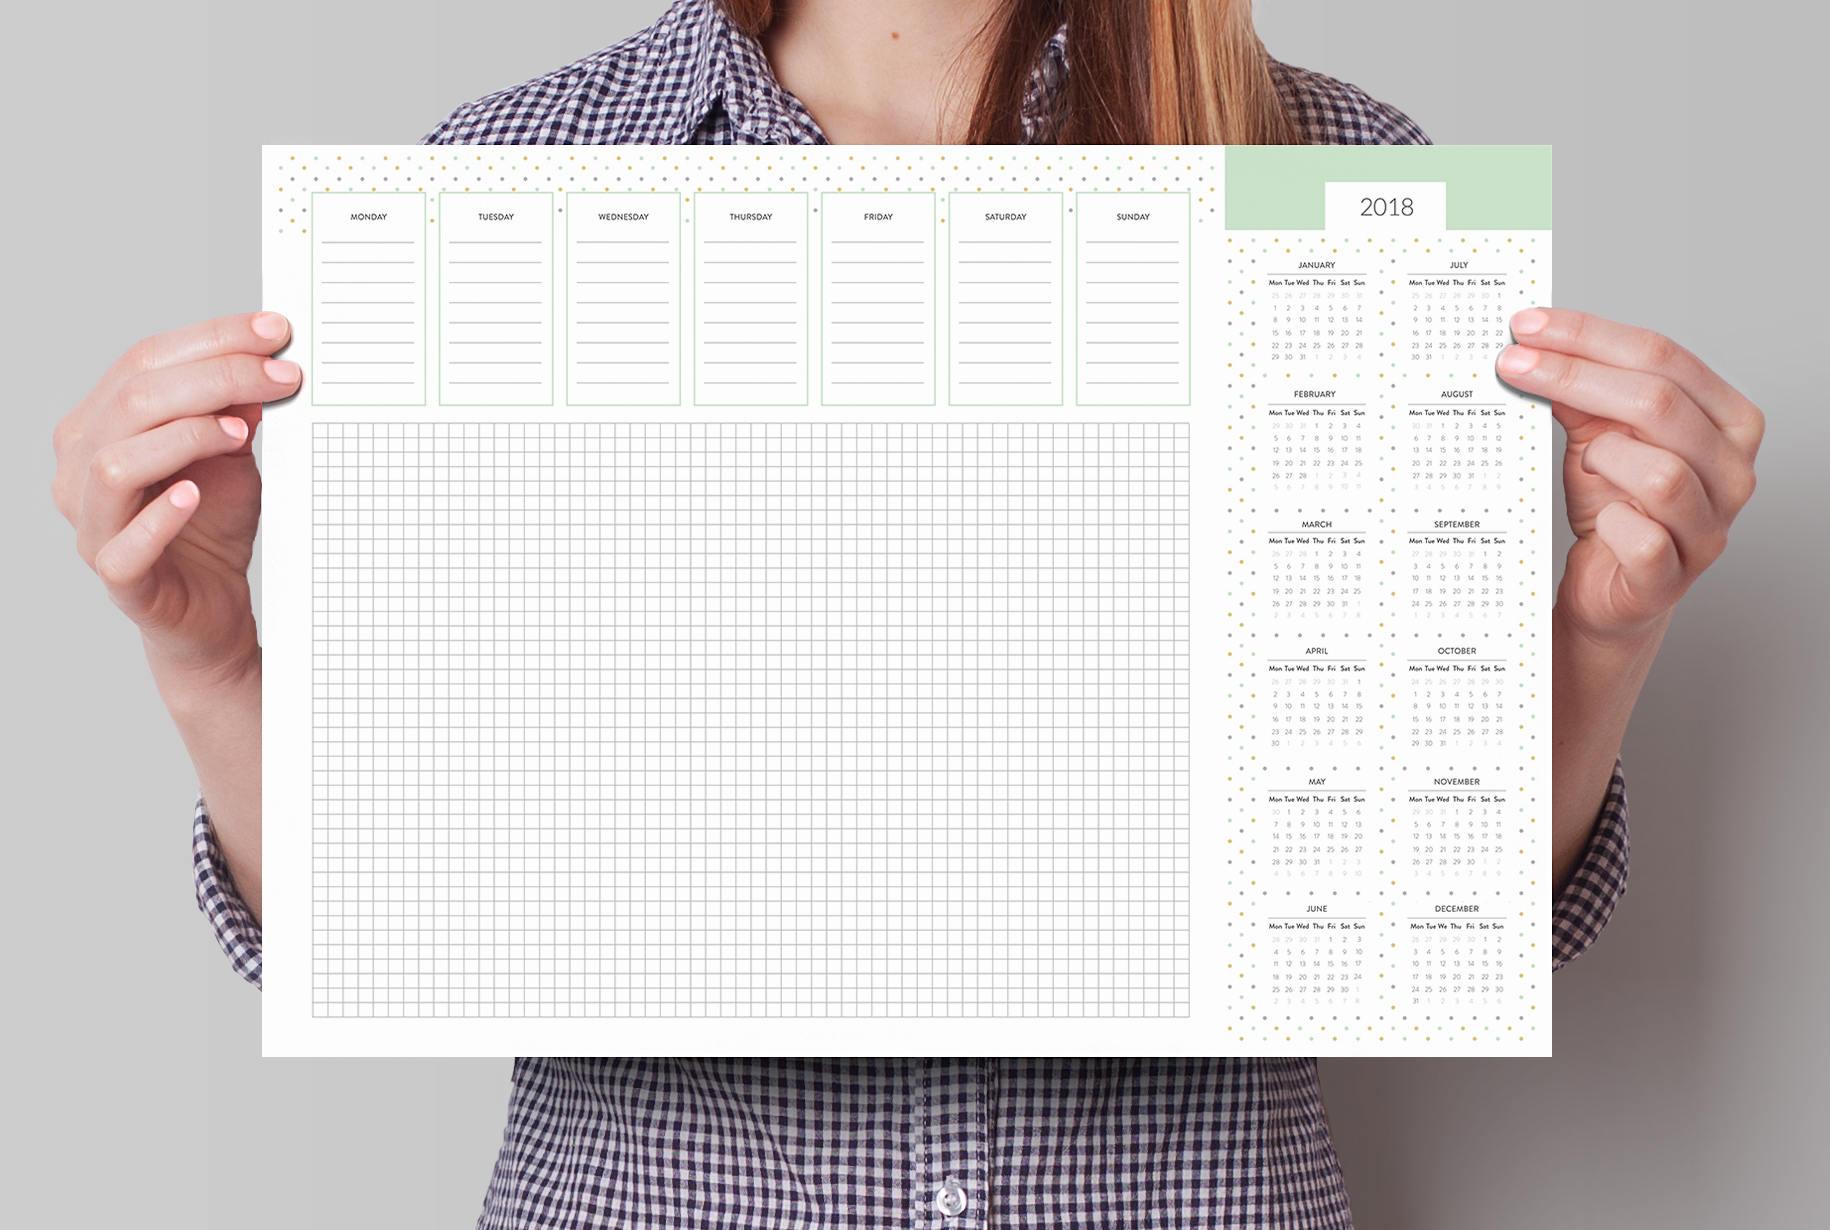 Monthly Weekly Planner Desk Pad A Desk Pad Calendar With - Desk blotter calendar